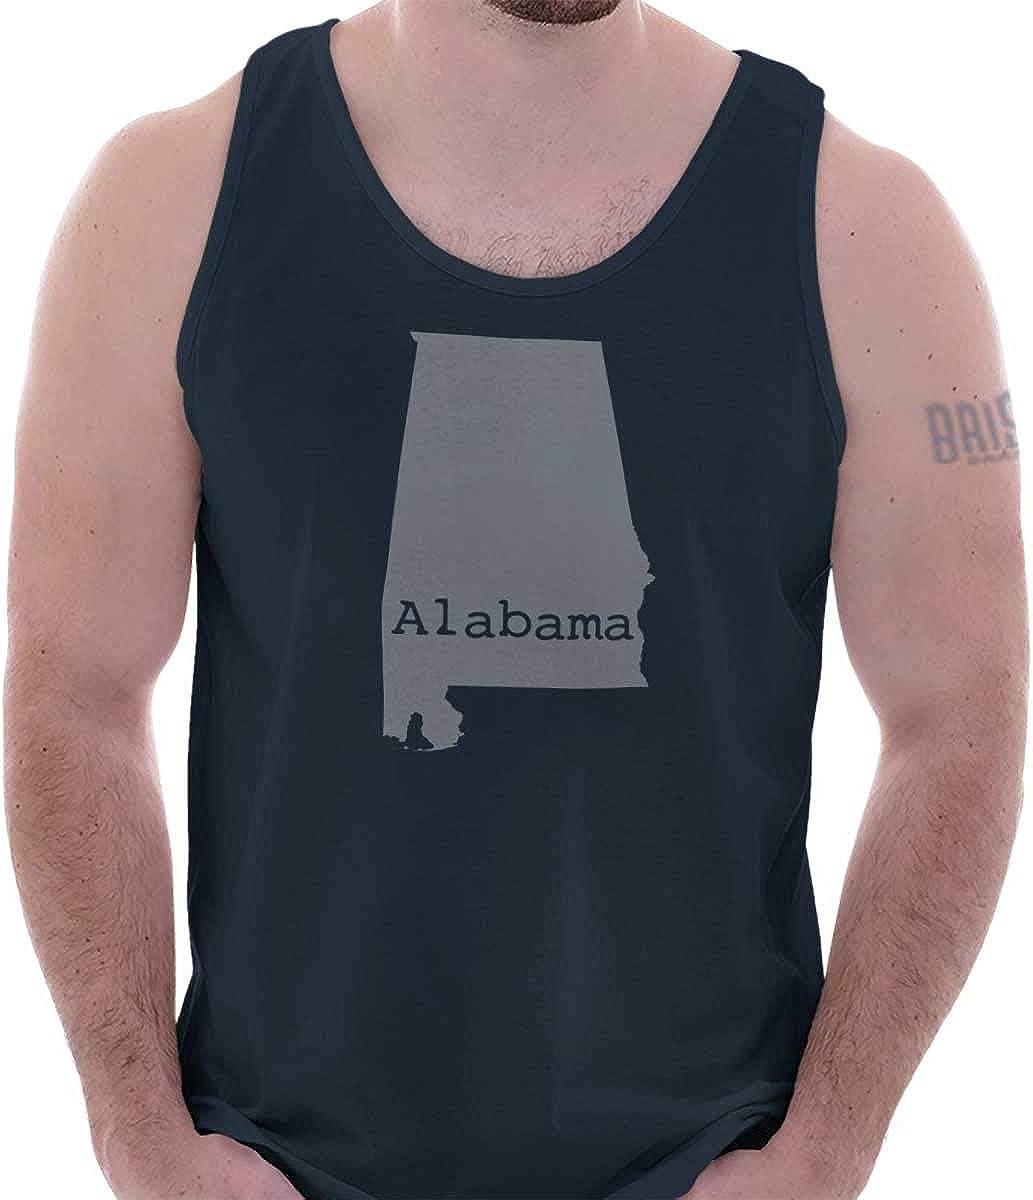 B018UNPC6U Classic Teaze Alabama State Map Shape Souvenir AL Pride Tank Top 51Fu6UcYC1L